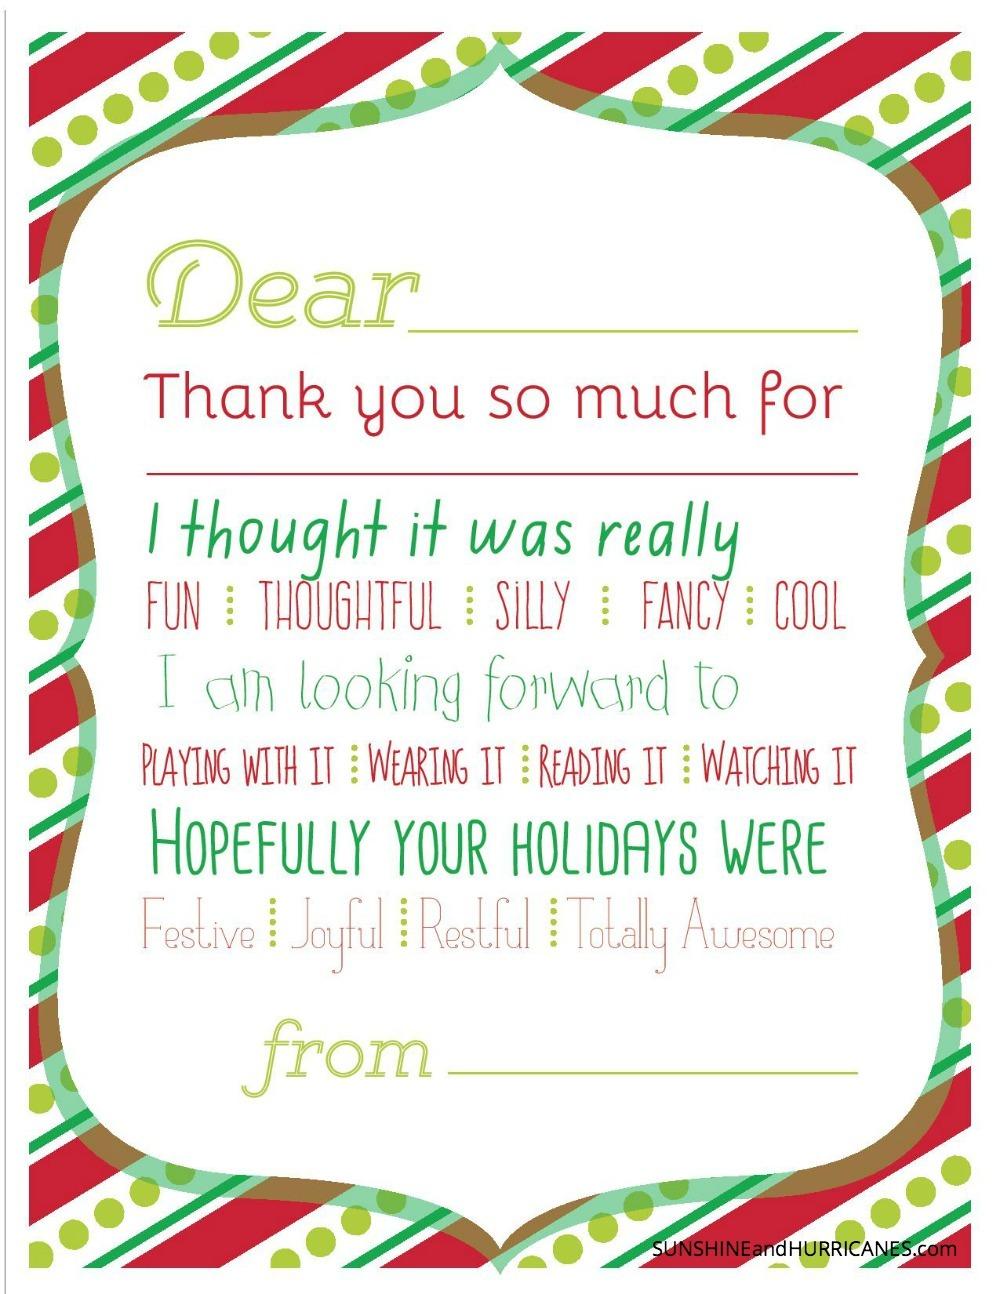 Fullsize Of Christmas Thank You Cards